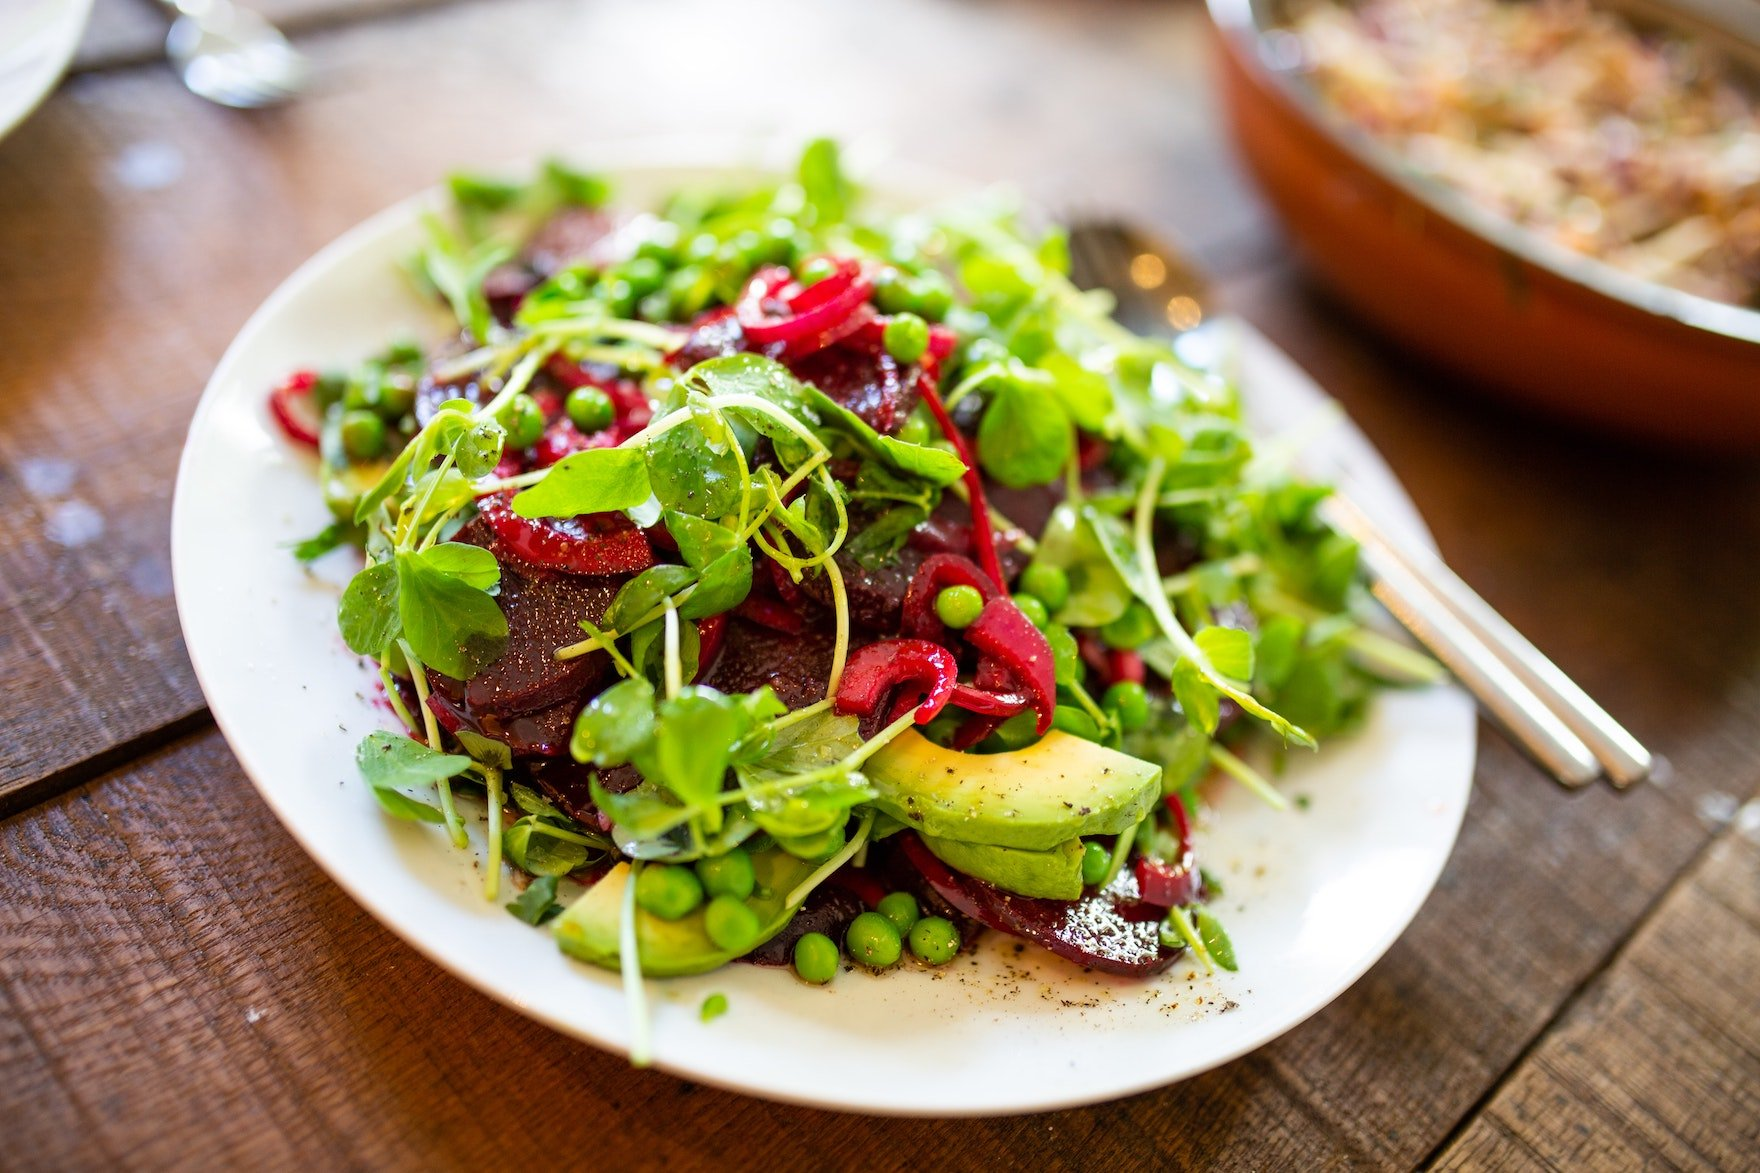 Salad at WildFit nutrition programme with Freya Sherlock